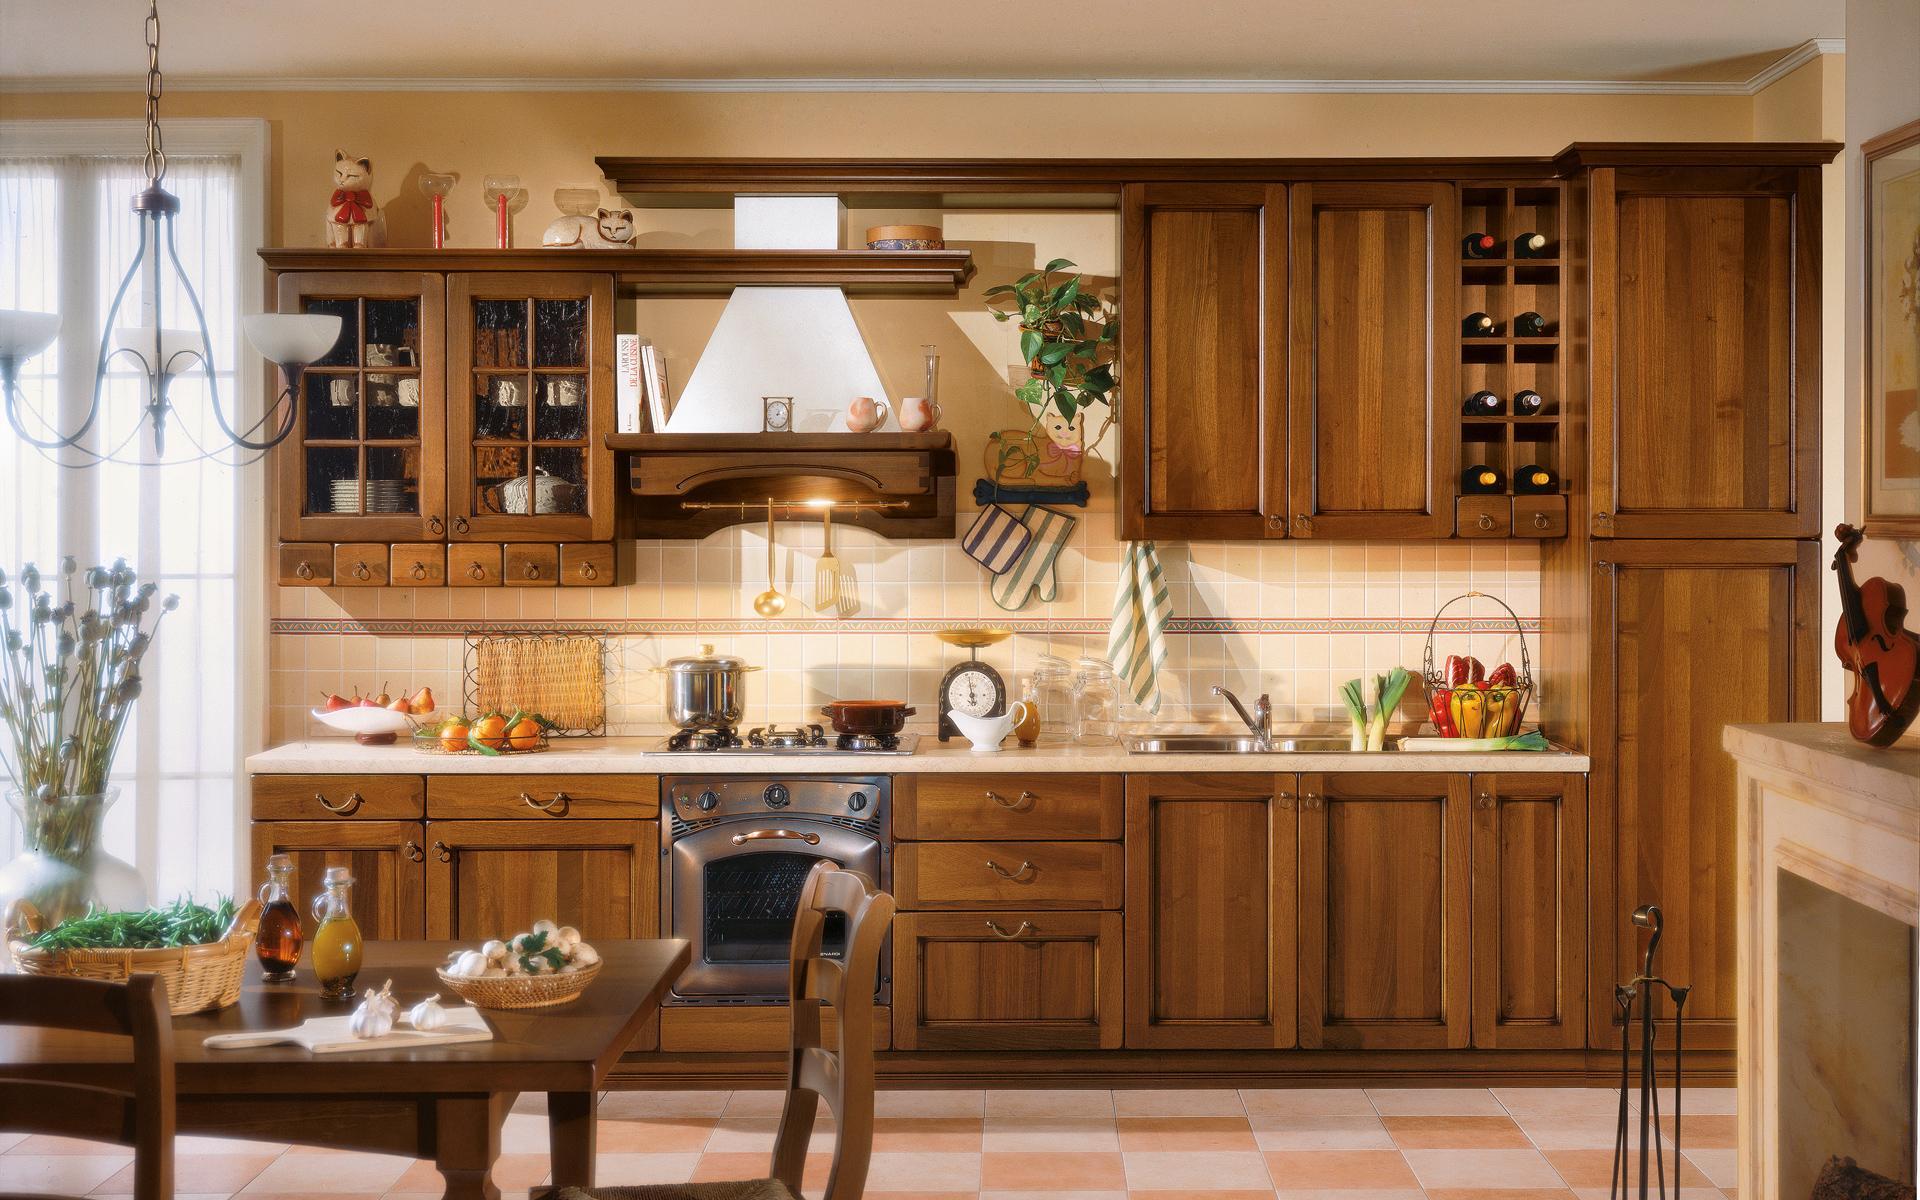 Cucine A Scomparsa Economiche: Cucina in linea. Cucine componibili. .